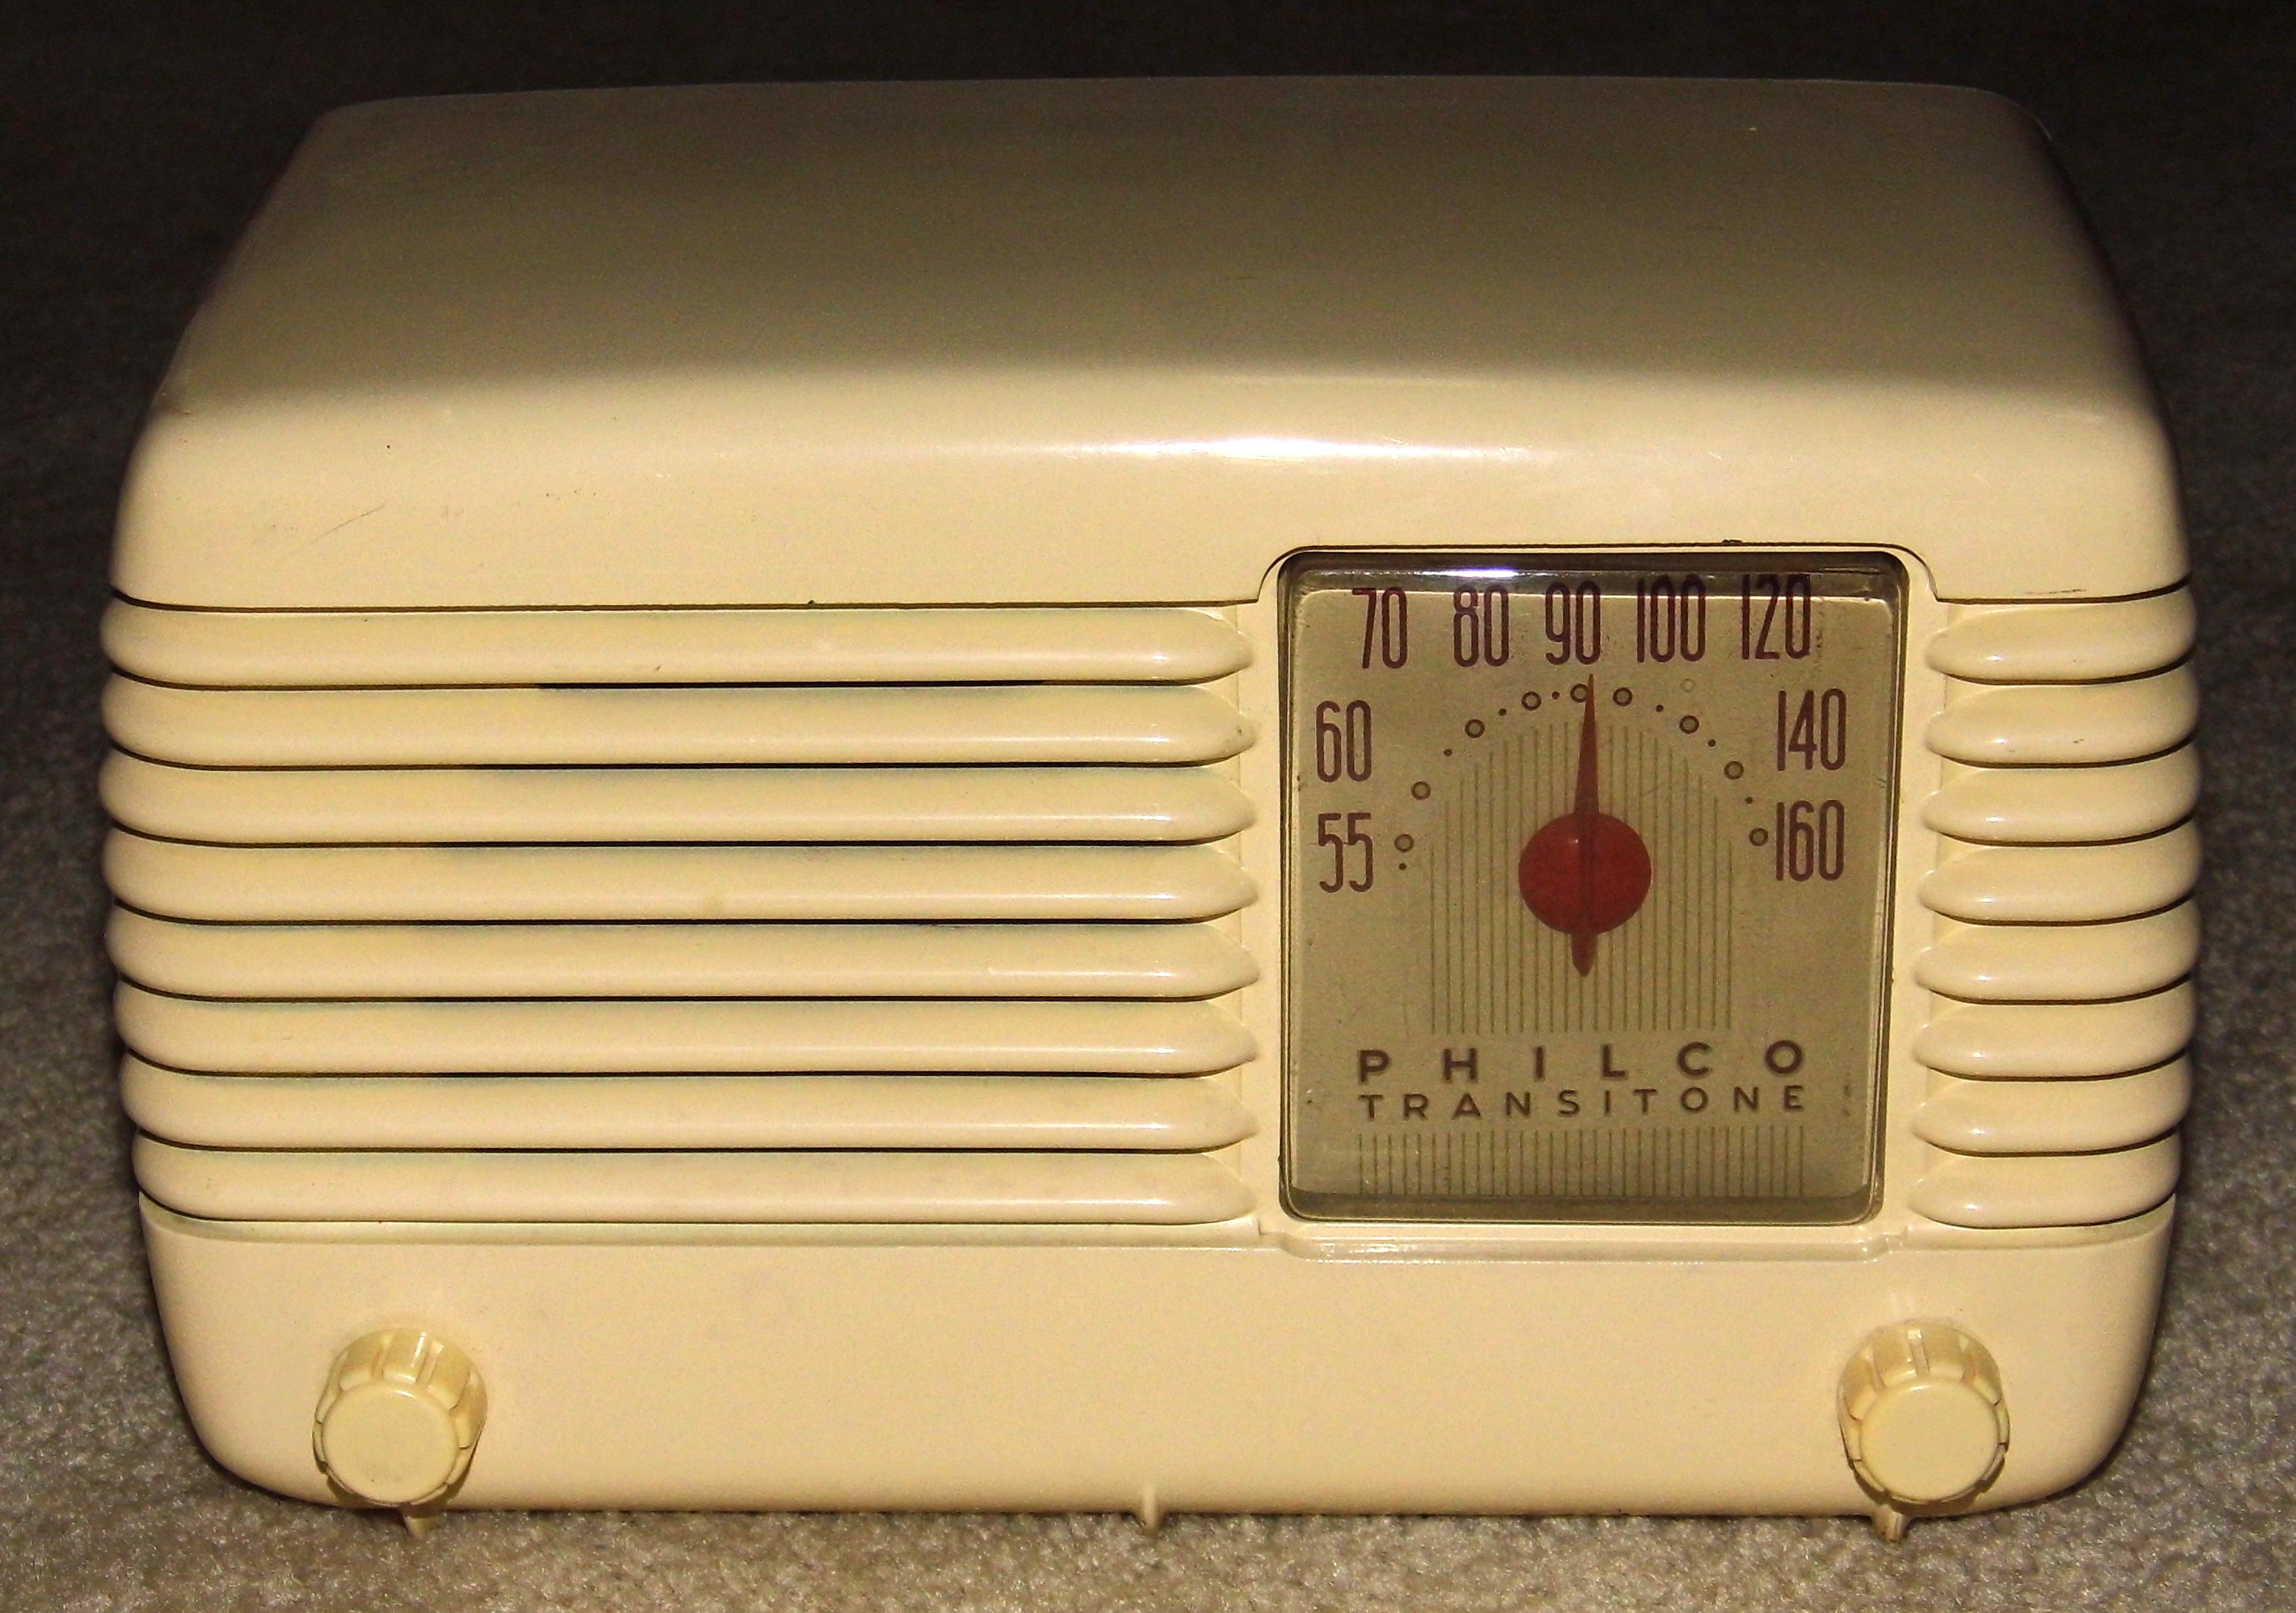 FileVintage Philco Transitone AM Table Radio Model 48 200 I 5